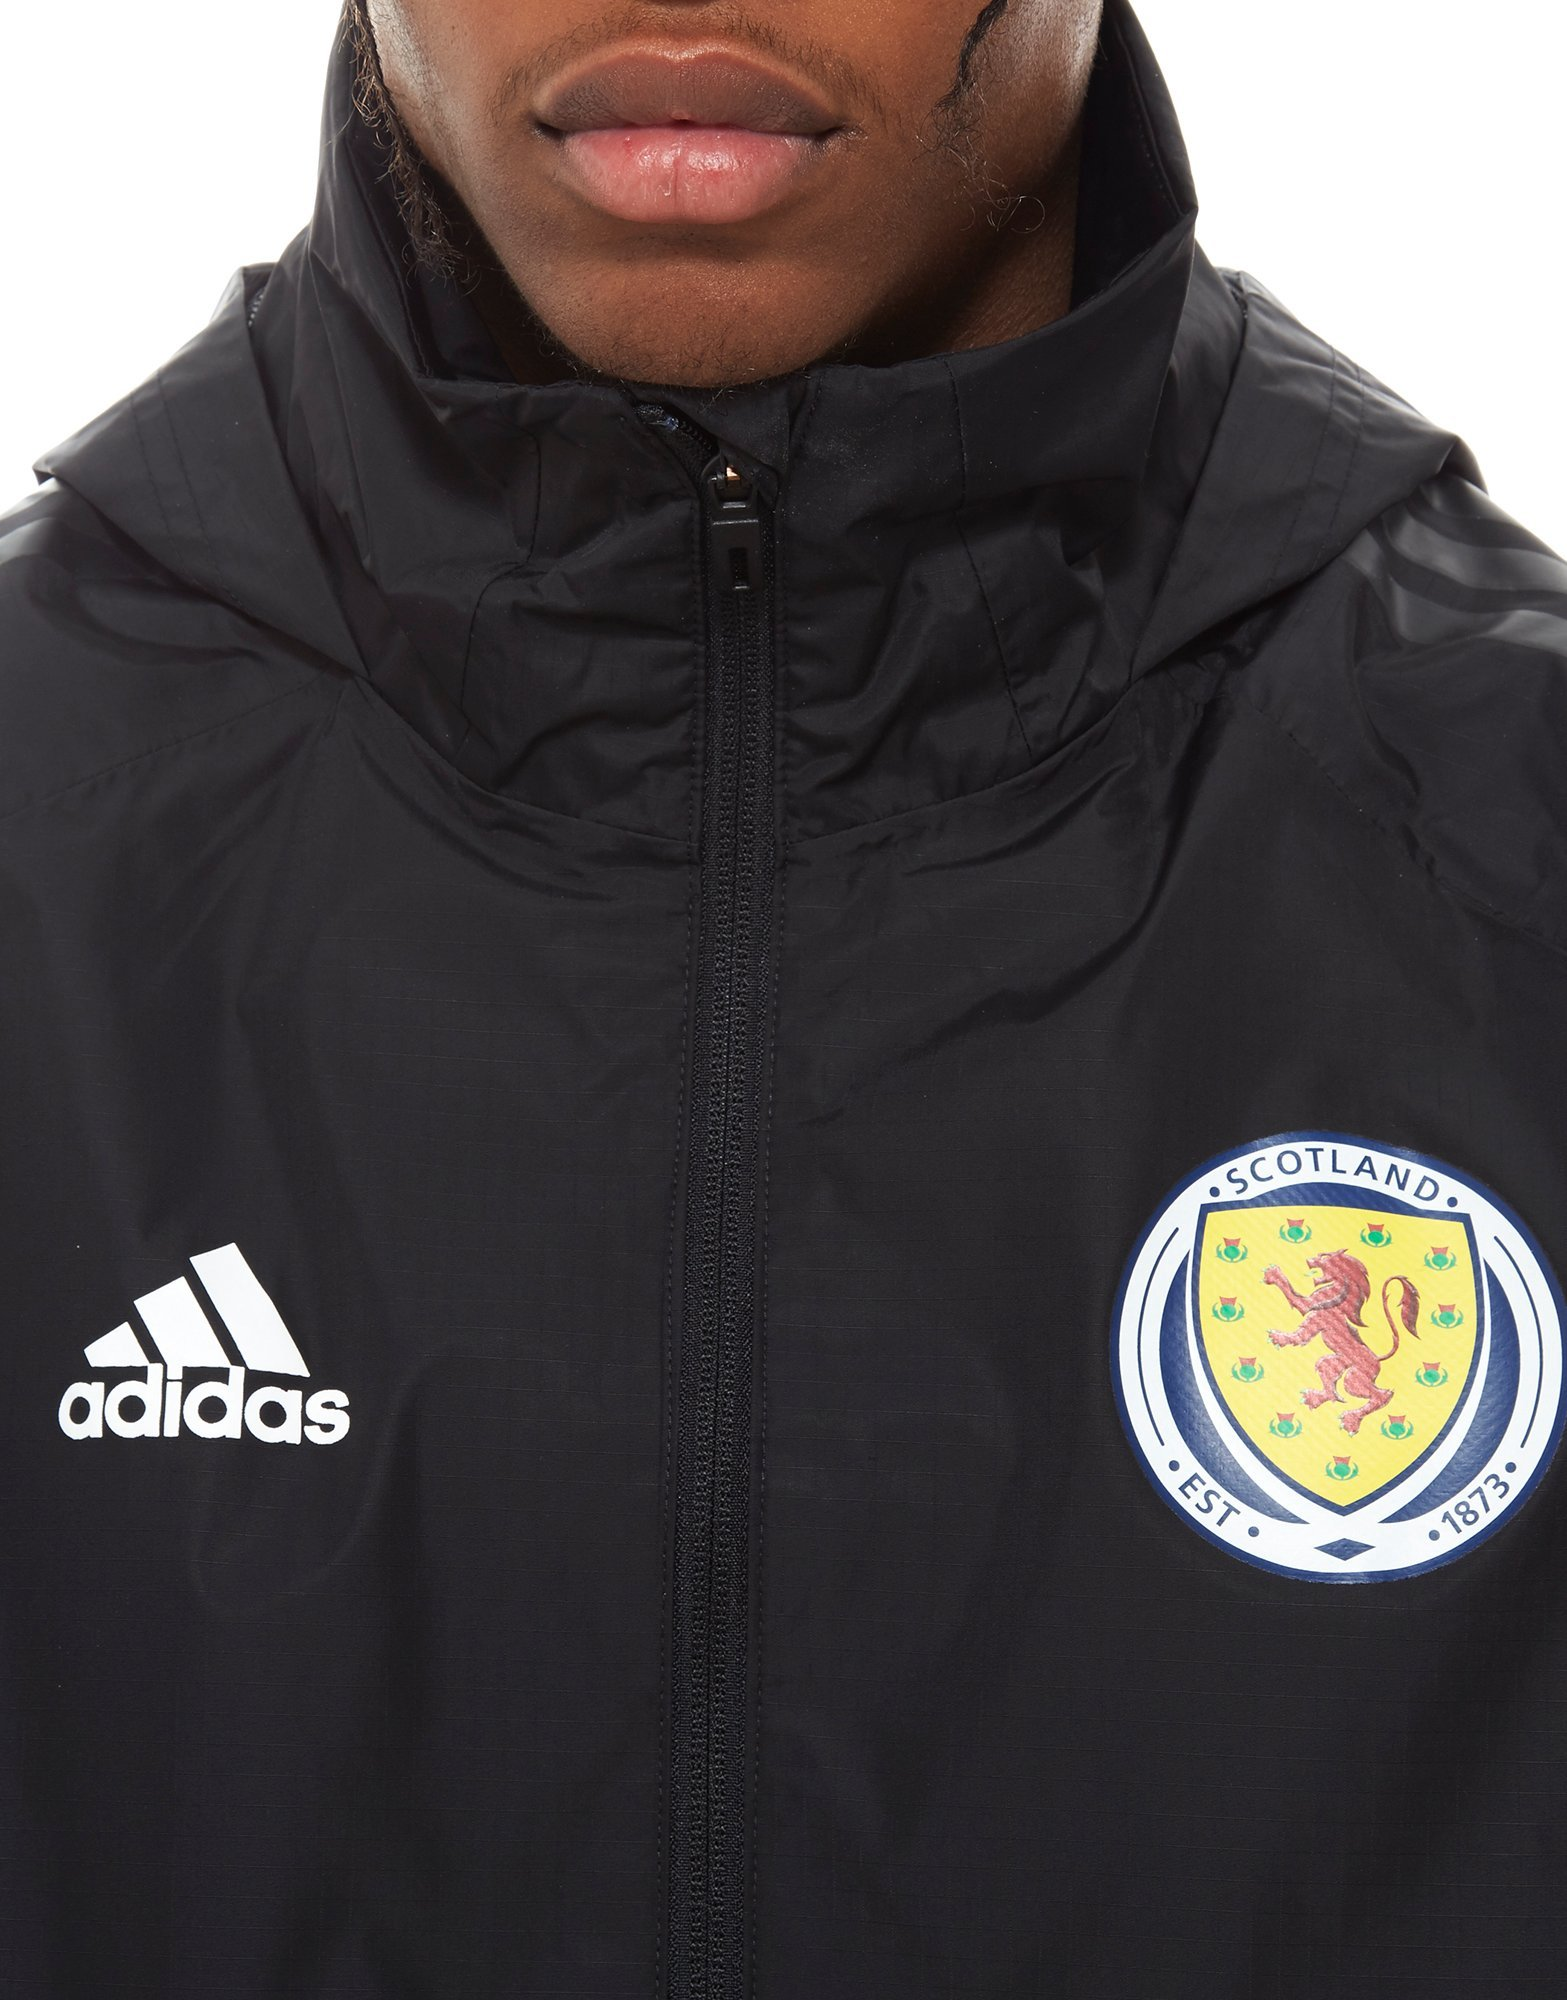 adidas Scotland FA 2018/19 Storm Jacket